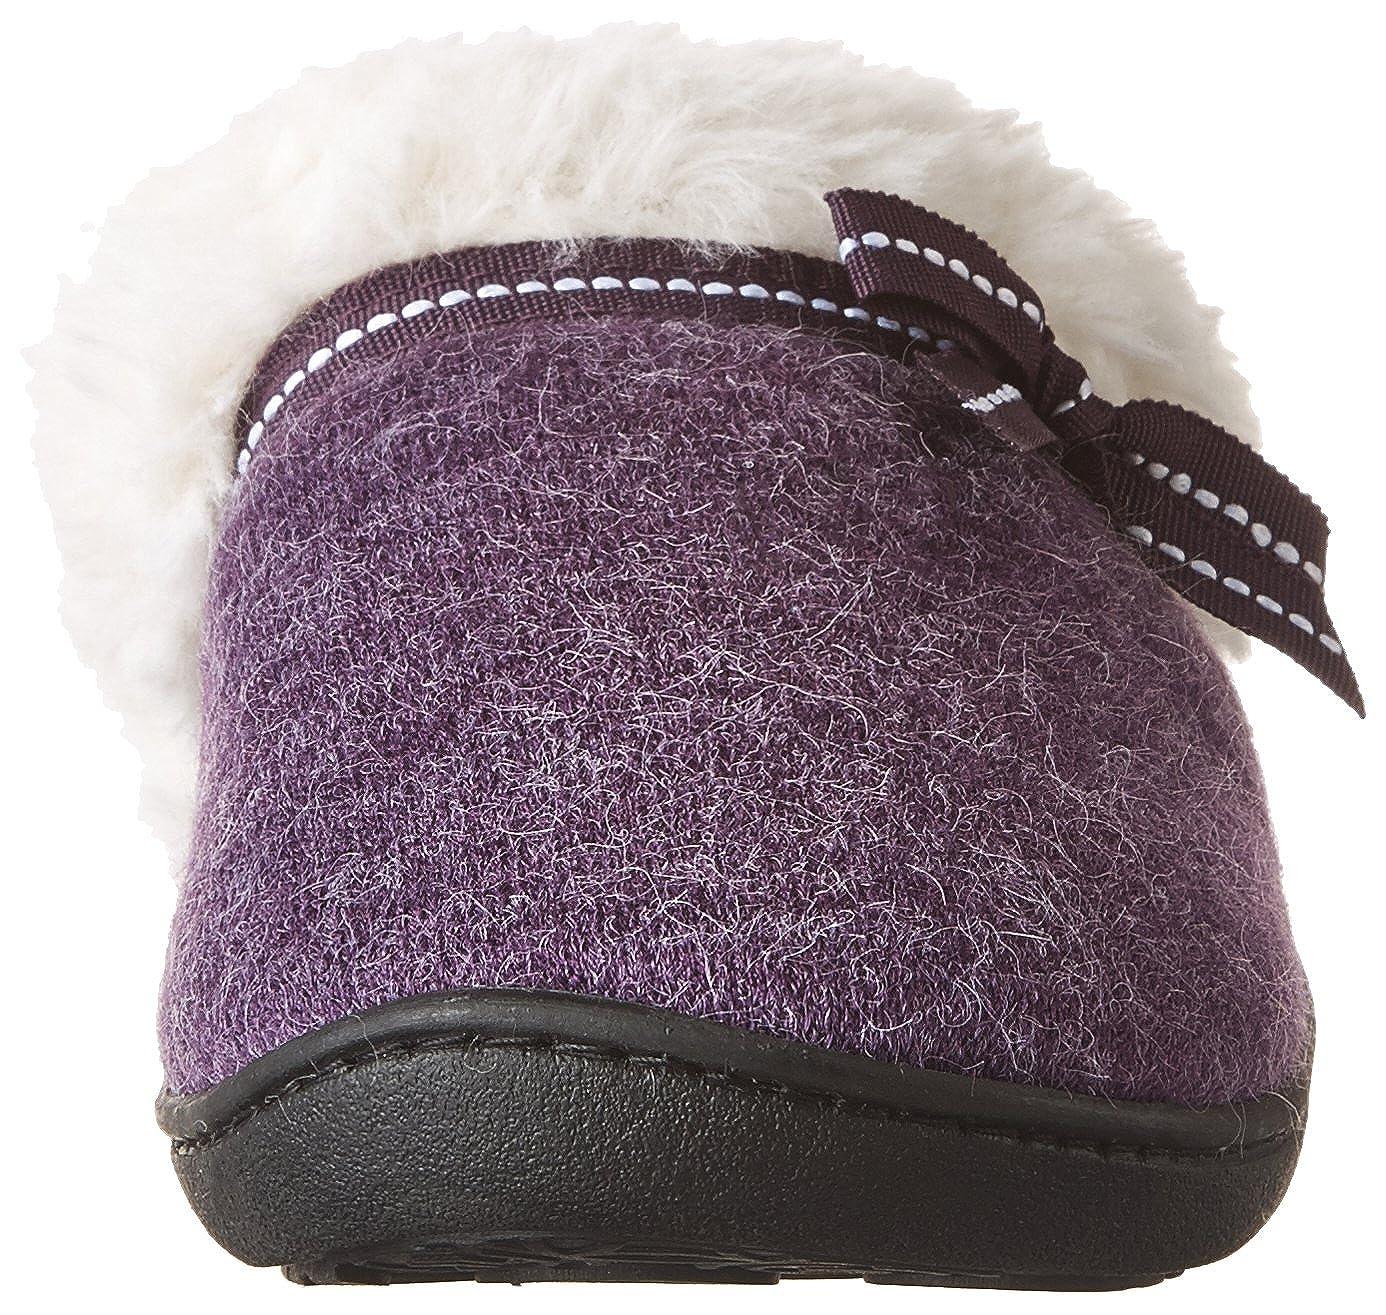 Isotoner Womens Heather Knit Hoodback Clogs